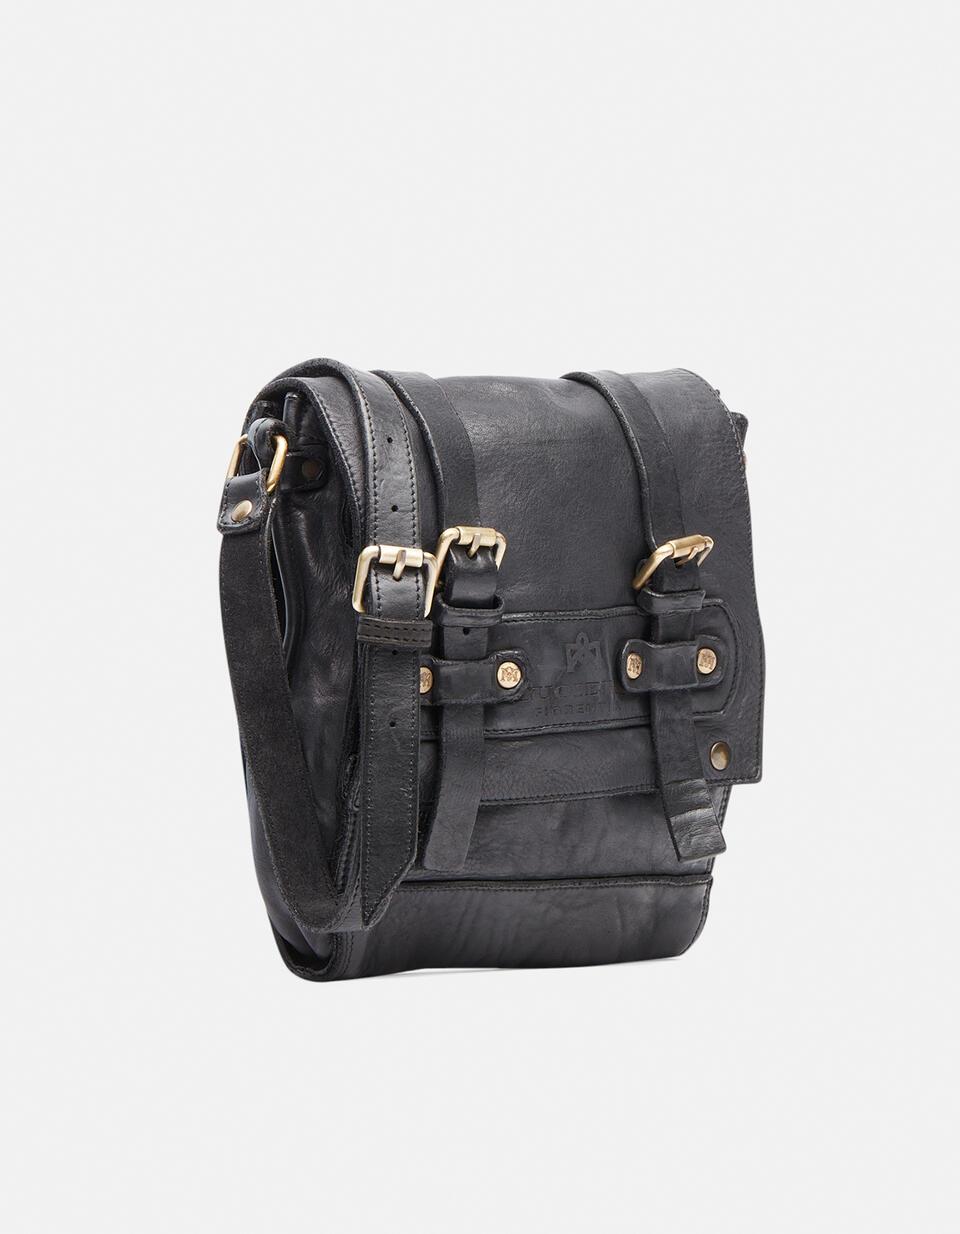 Millennial bag in natural leather NERO Cuoieria Fiorentina